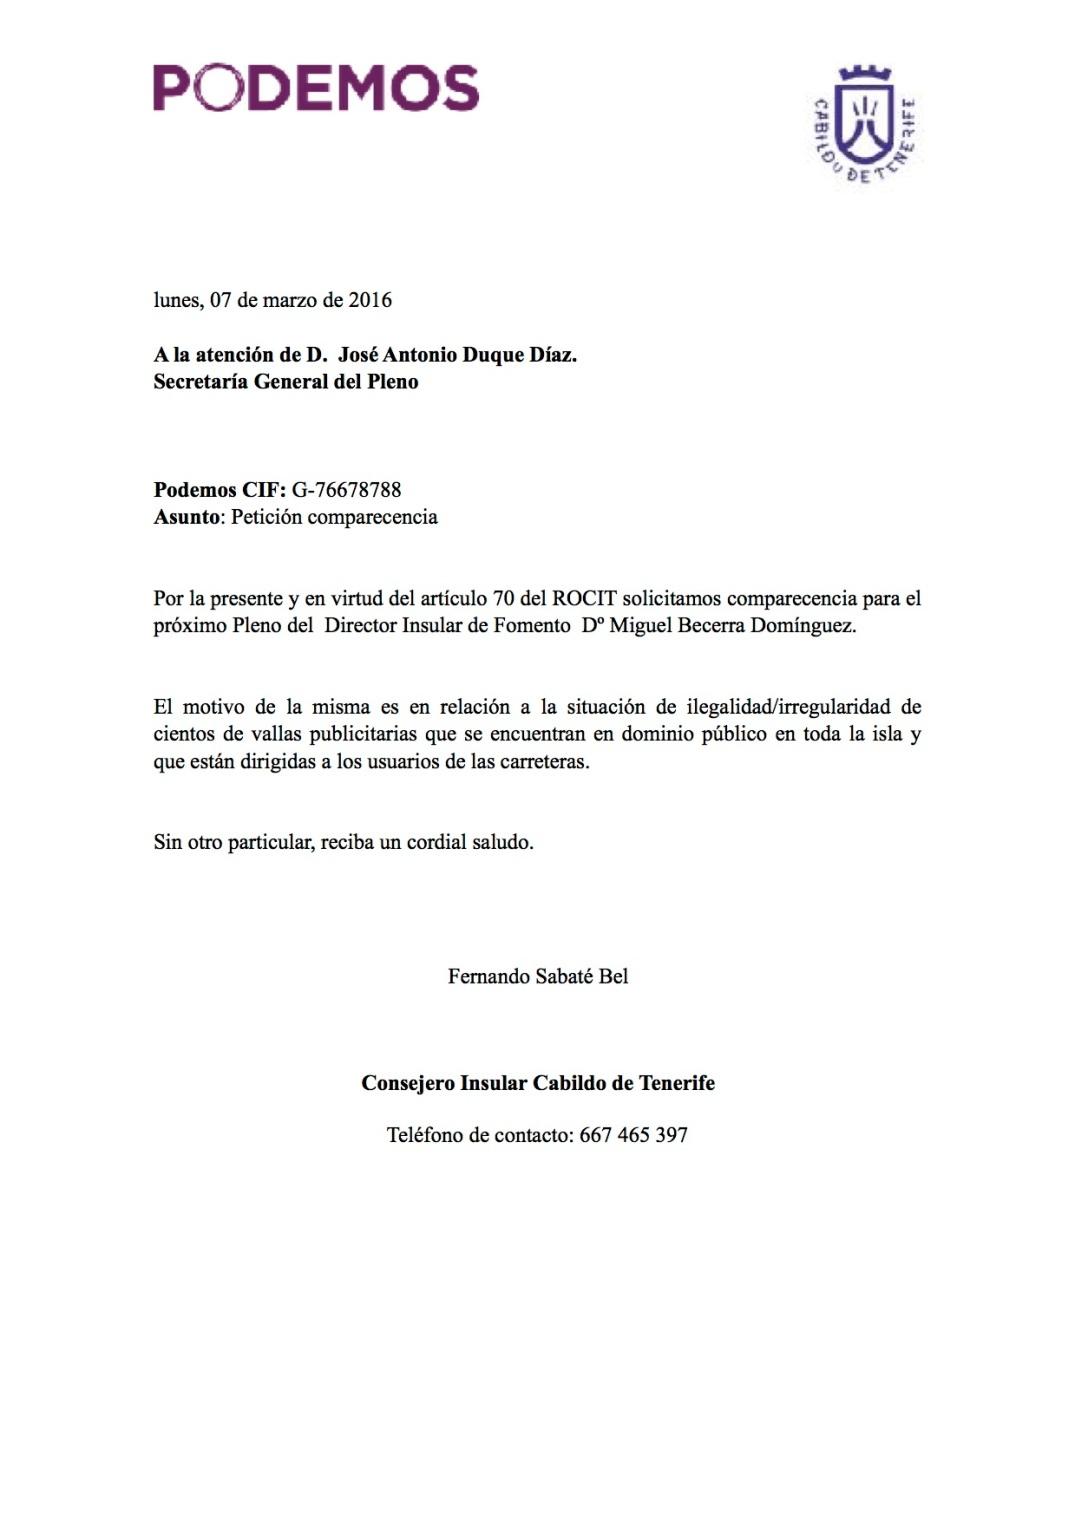 Solicitud Comparecencia Vallas Ilegales, Podemos Tenerife